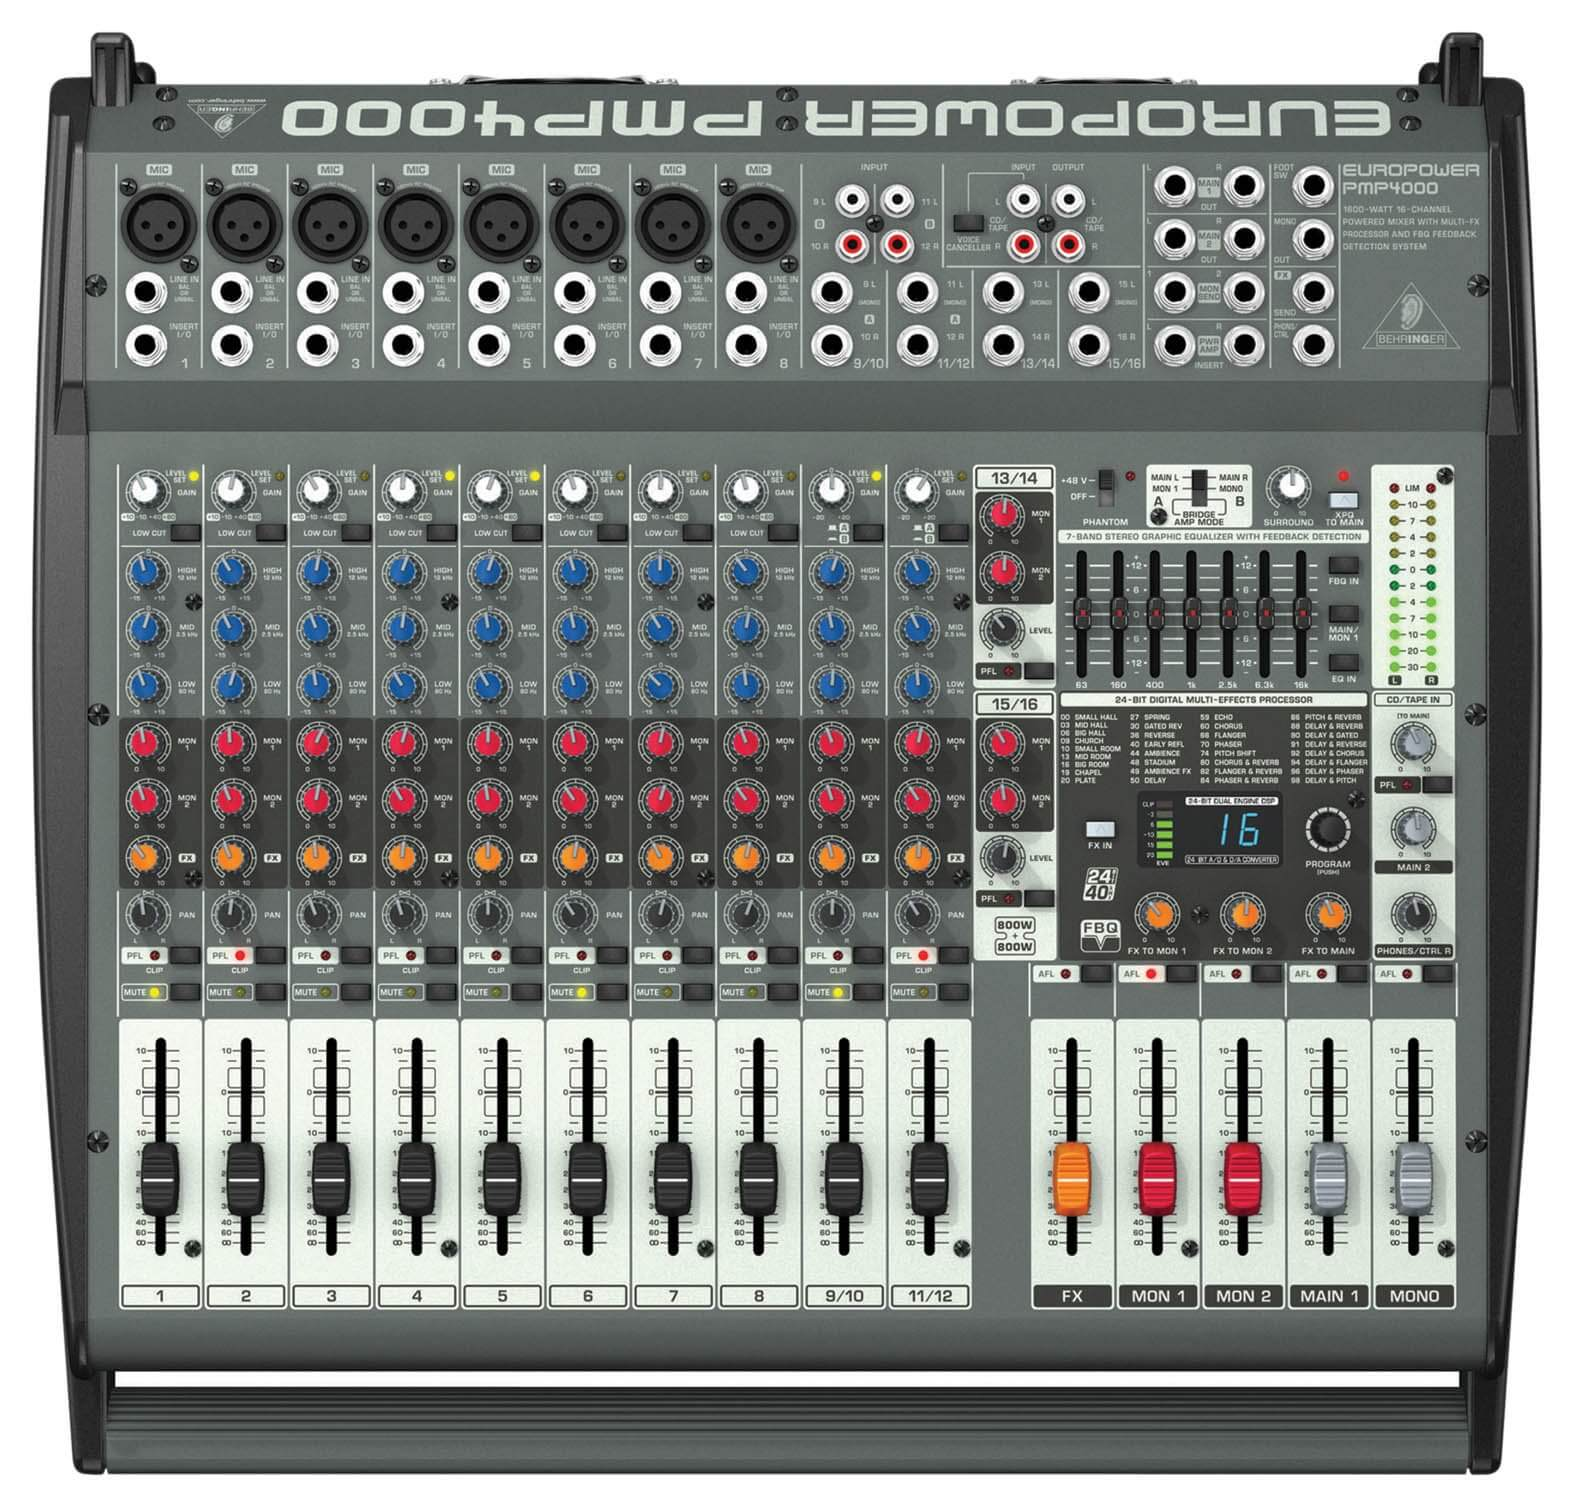 Behringer PMP4000 Europower Flatbed Mixer Amplifier